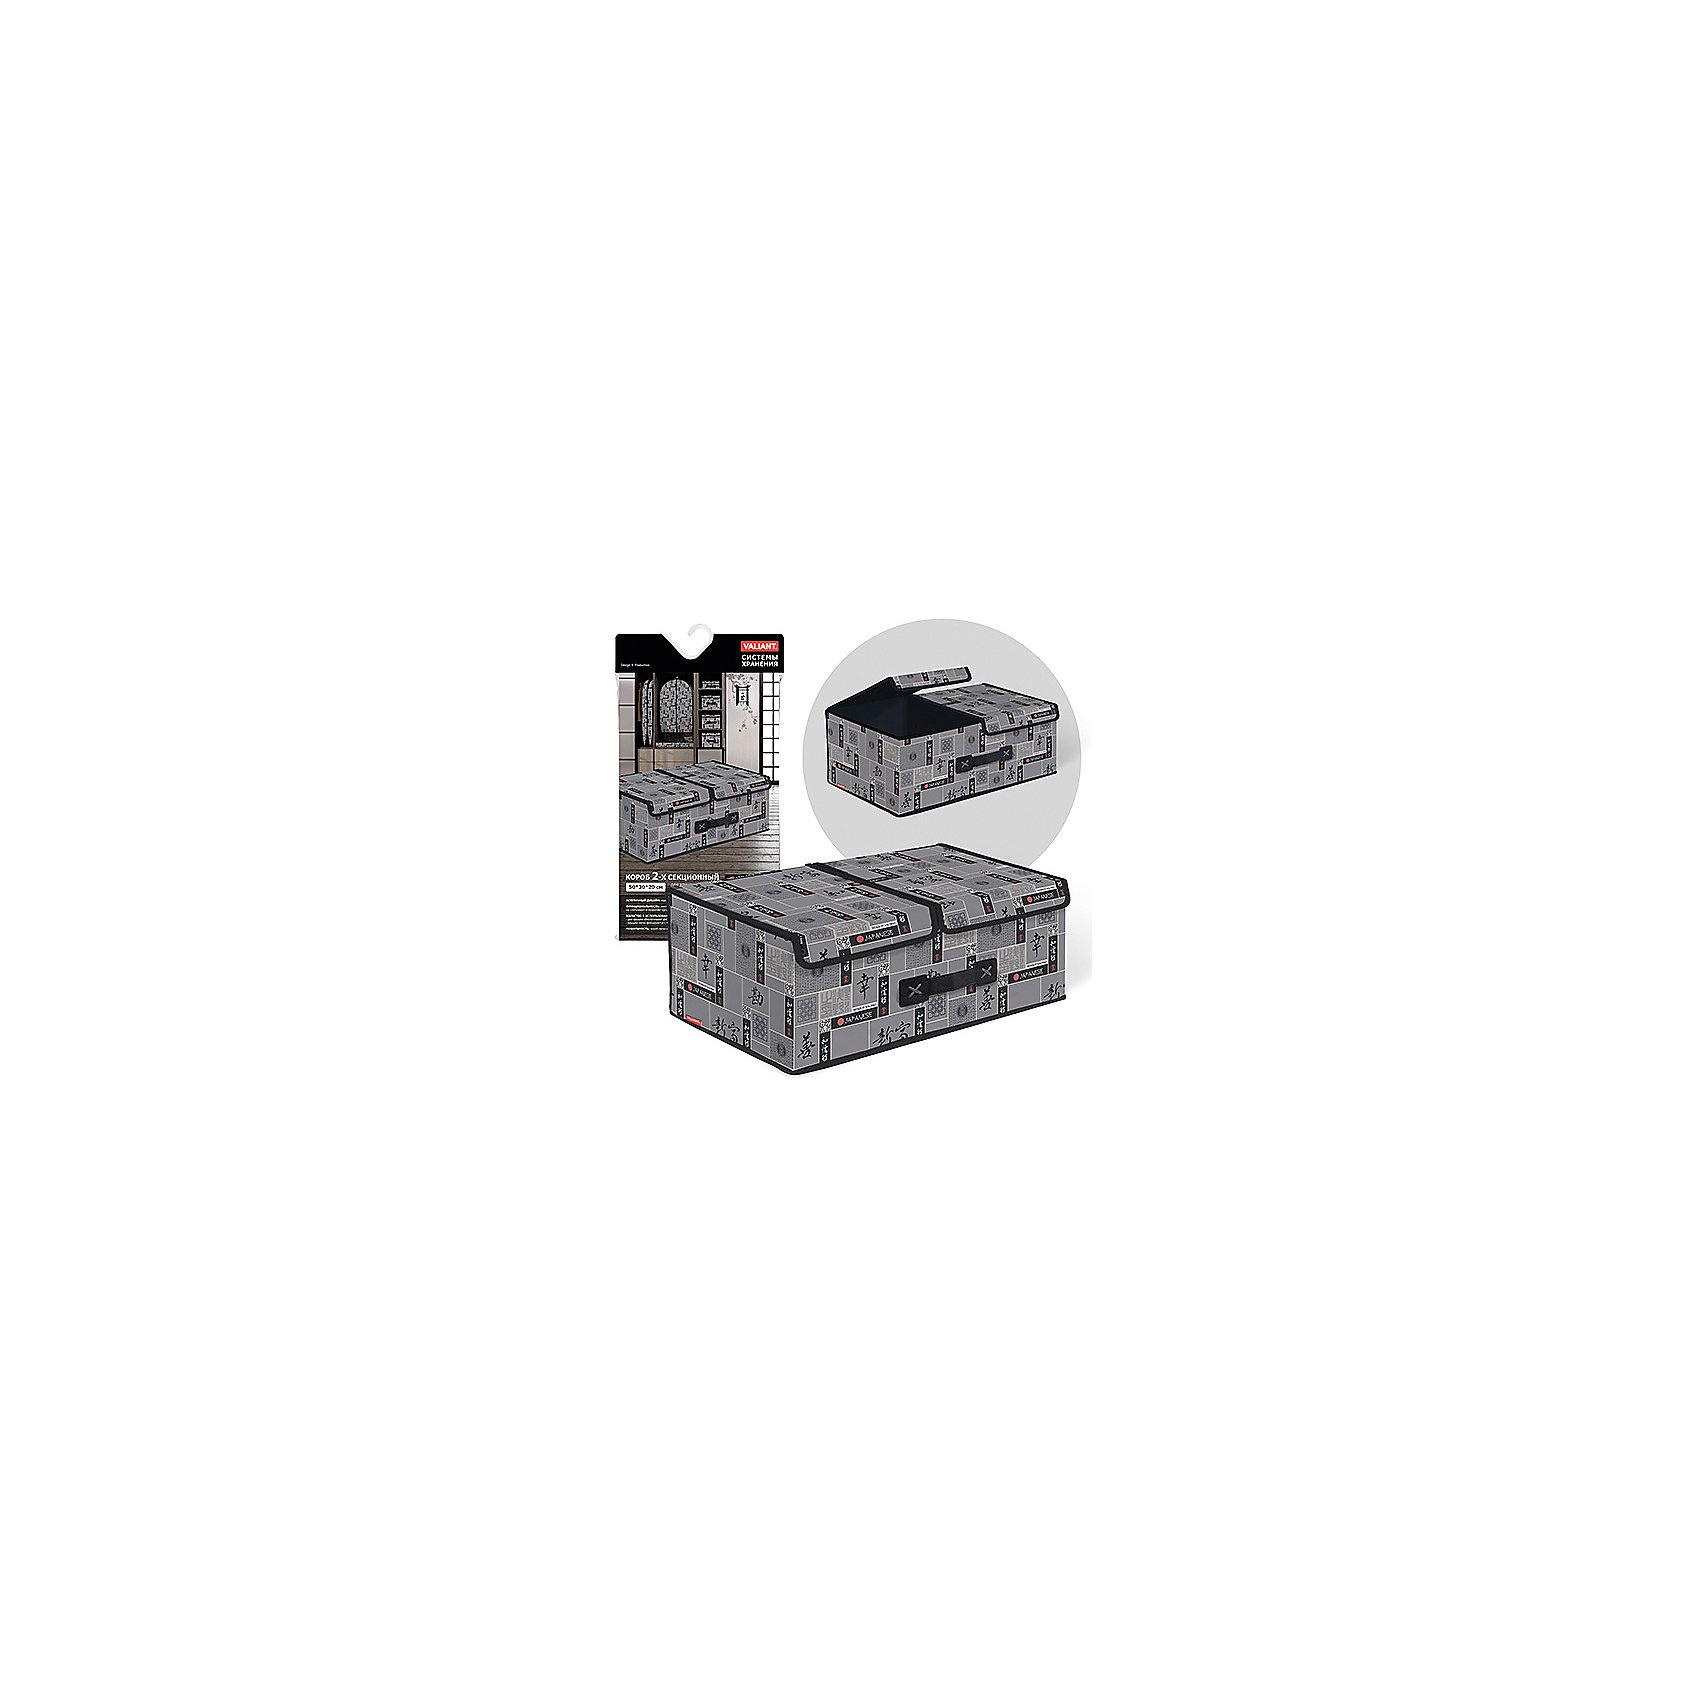 VALIANT Короб стеллажный 2-х секционный, 50*30*20см, JAPANESE BLACK, Valiant